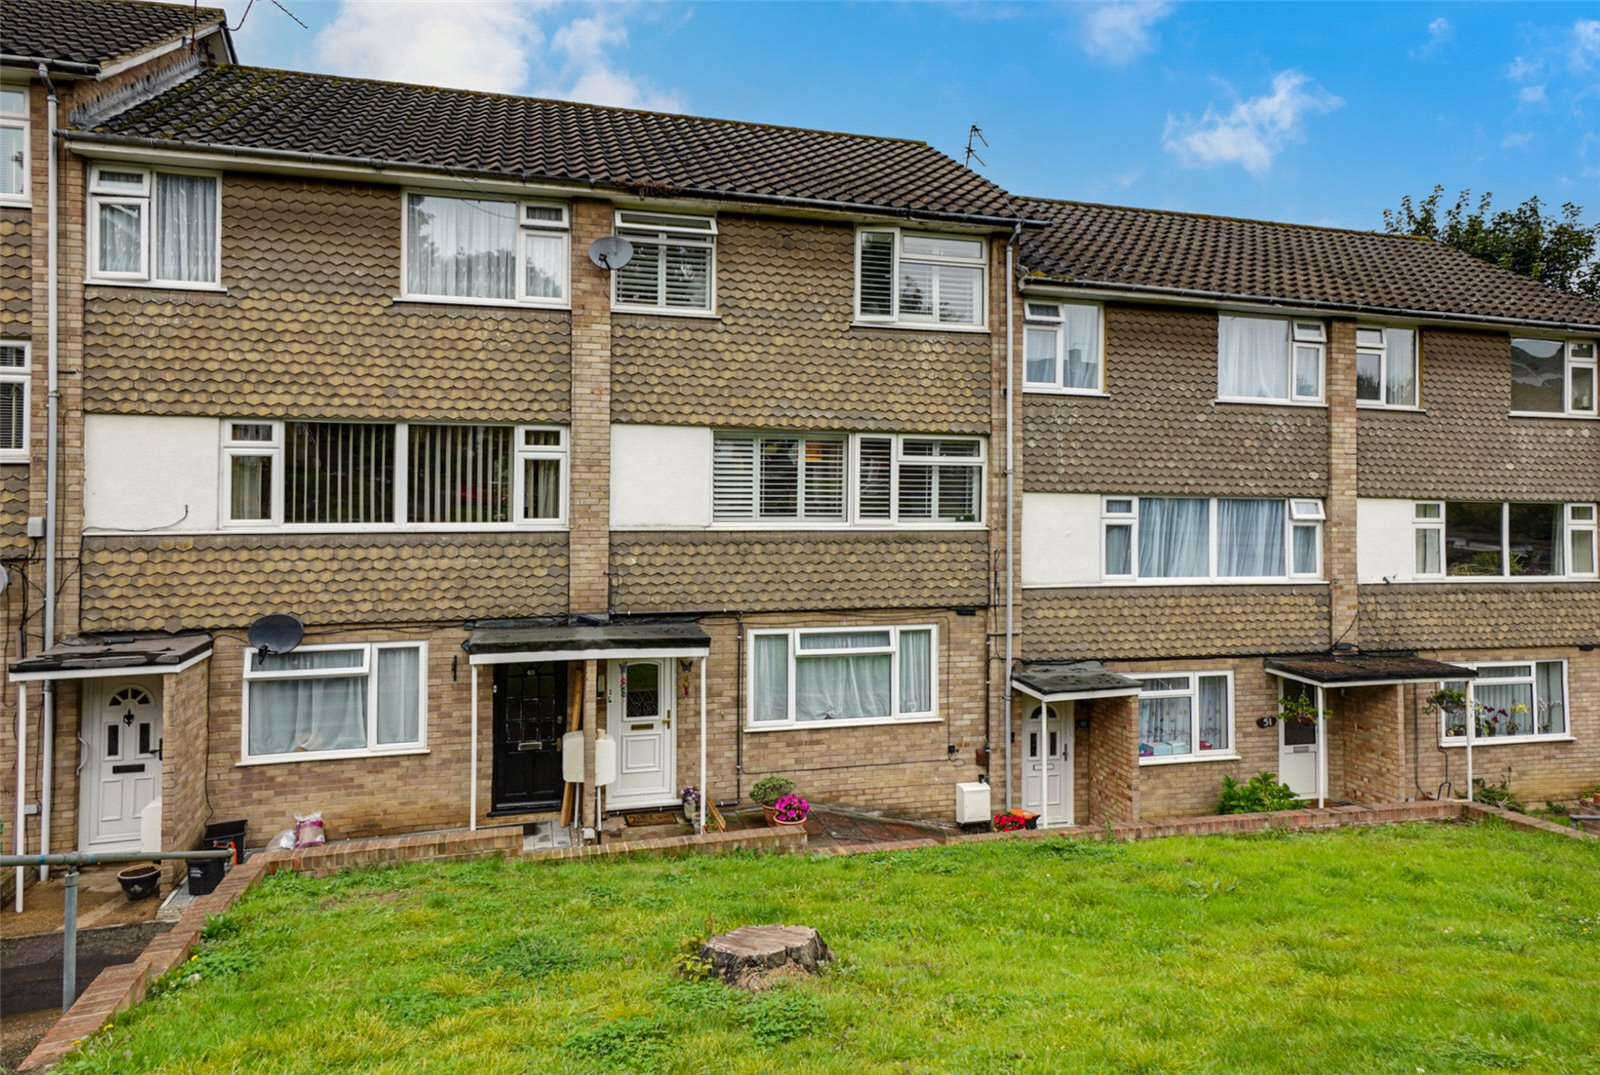 3 bed apartment for sale in Dixon Close, Maidstone, ME15